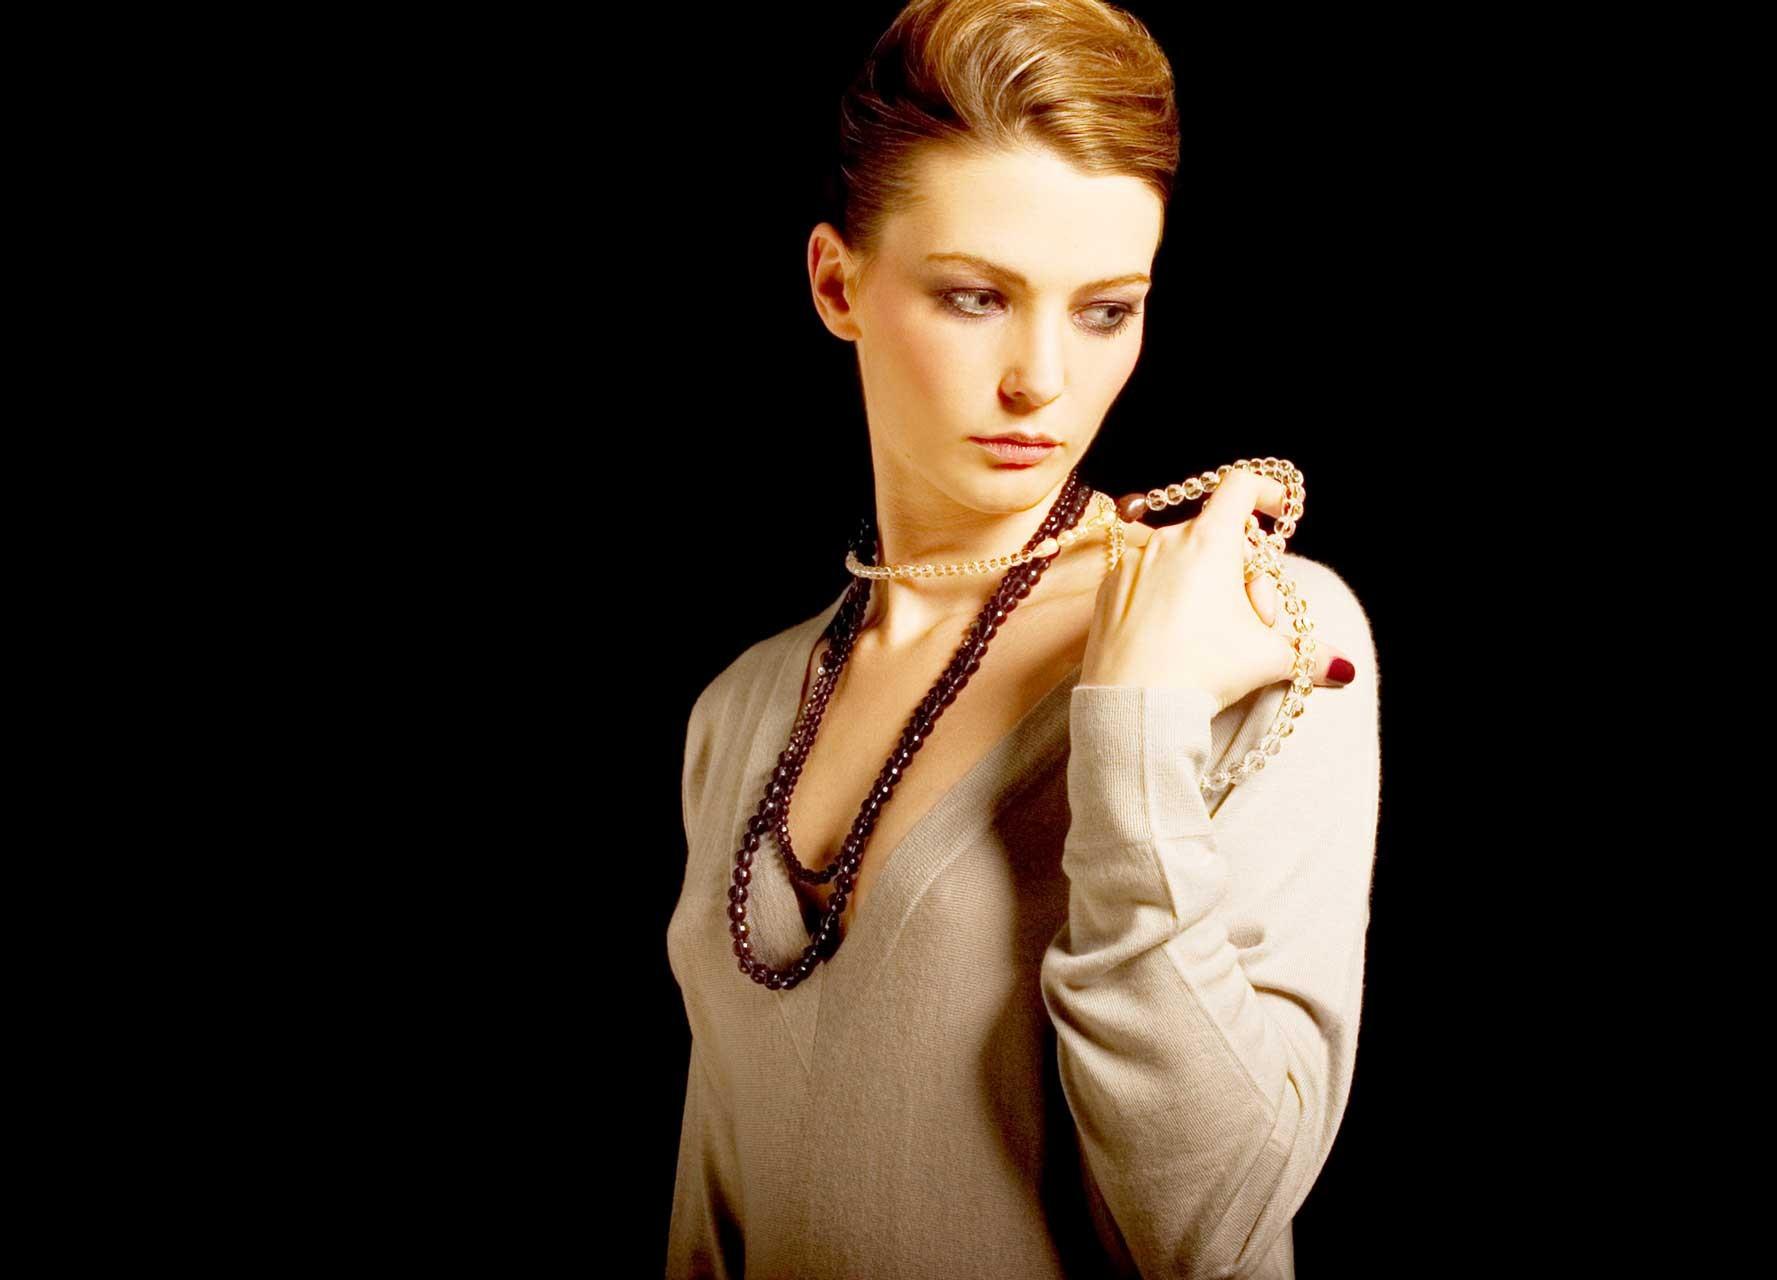 Laure-Maud_photographe-mode_Zaza-Factory_Regina-Rubens_4